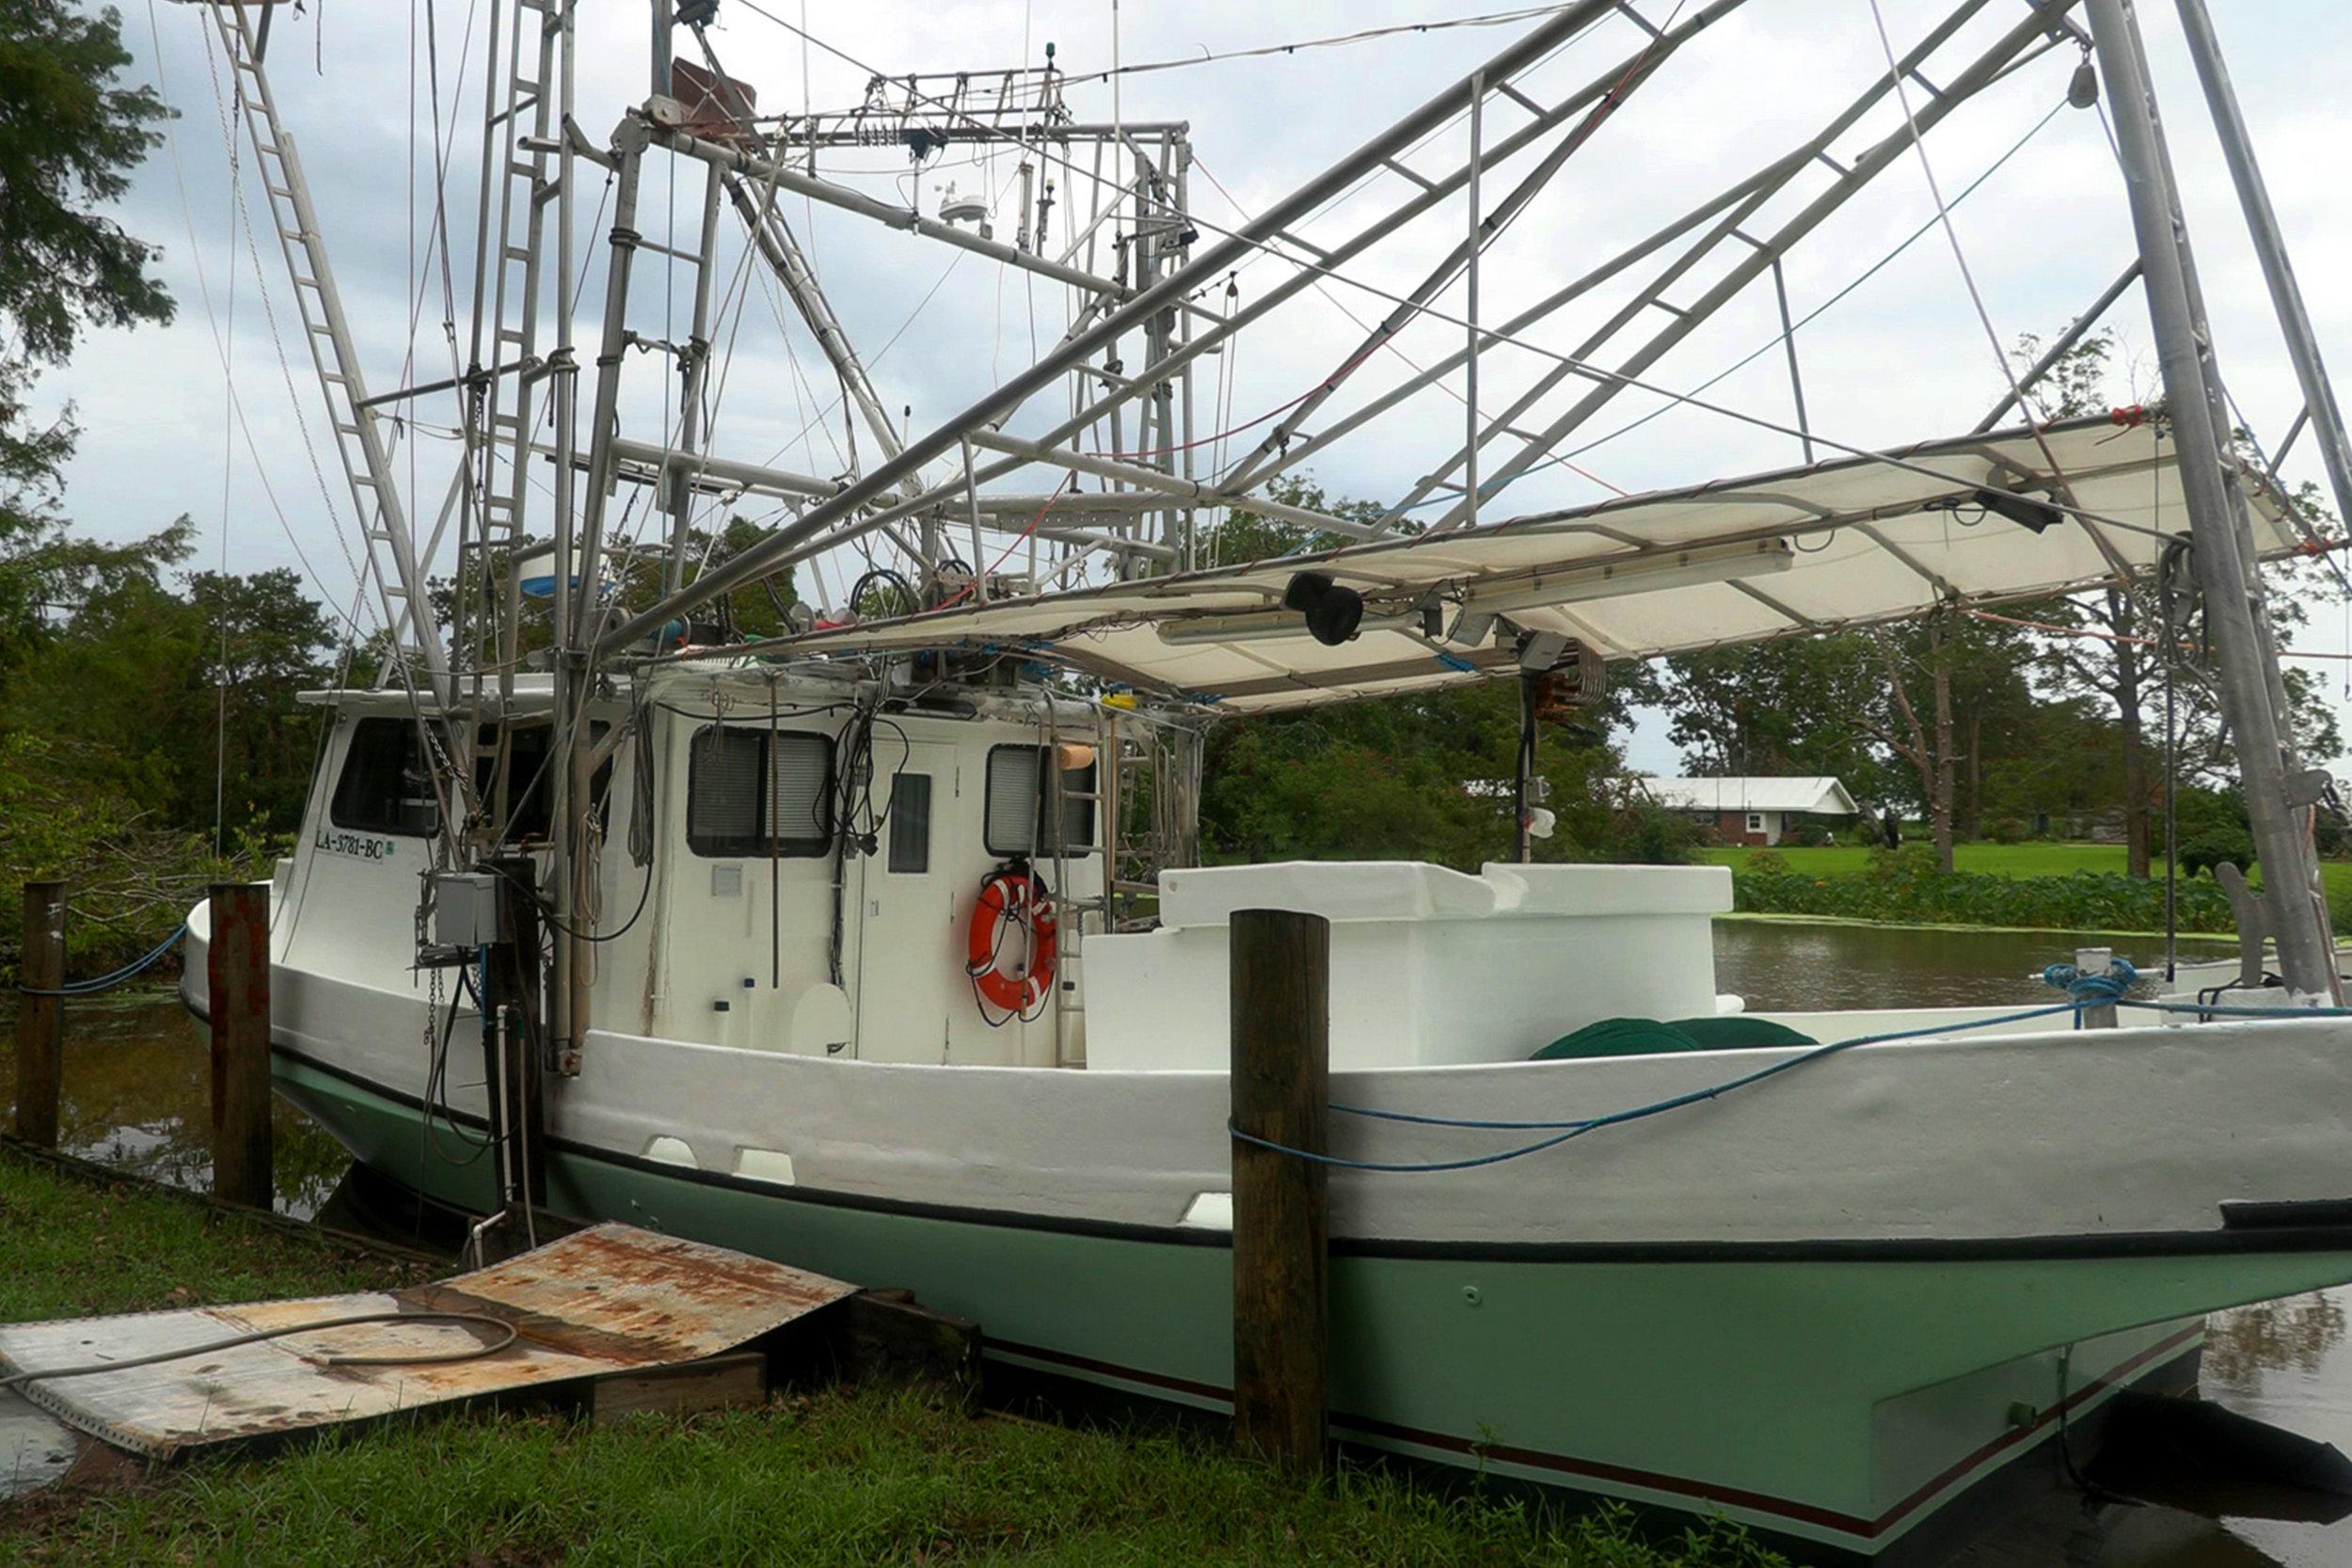 SquarespaceImage19-marinefisheries-shrimpboat.jpg